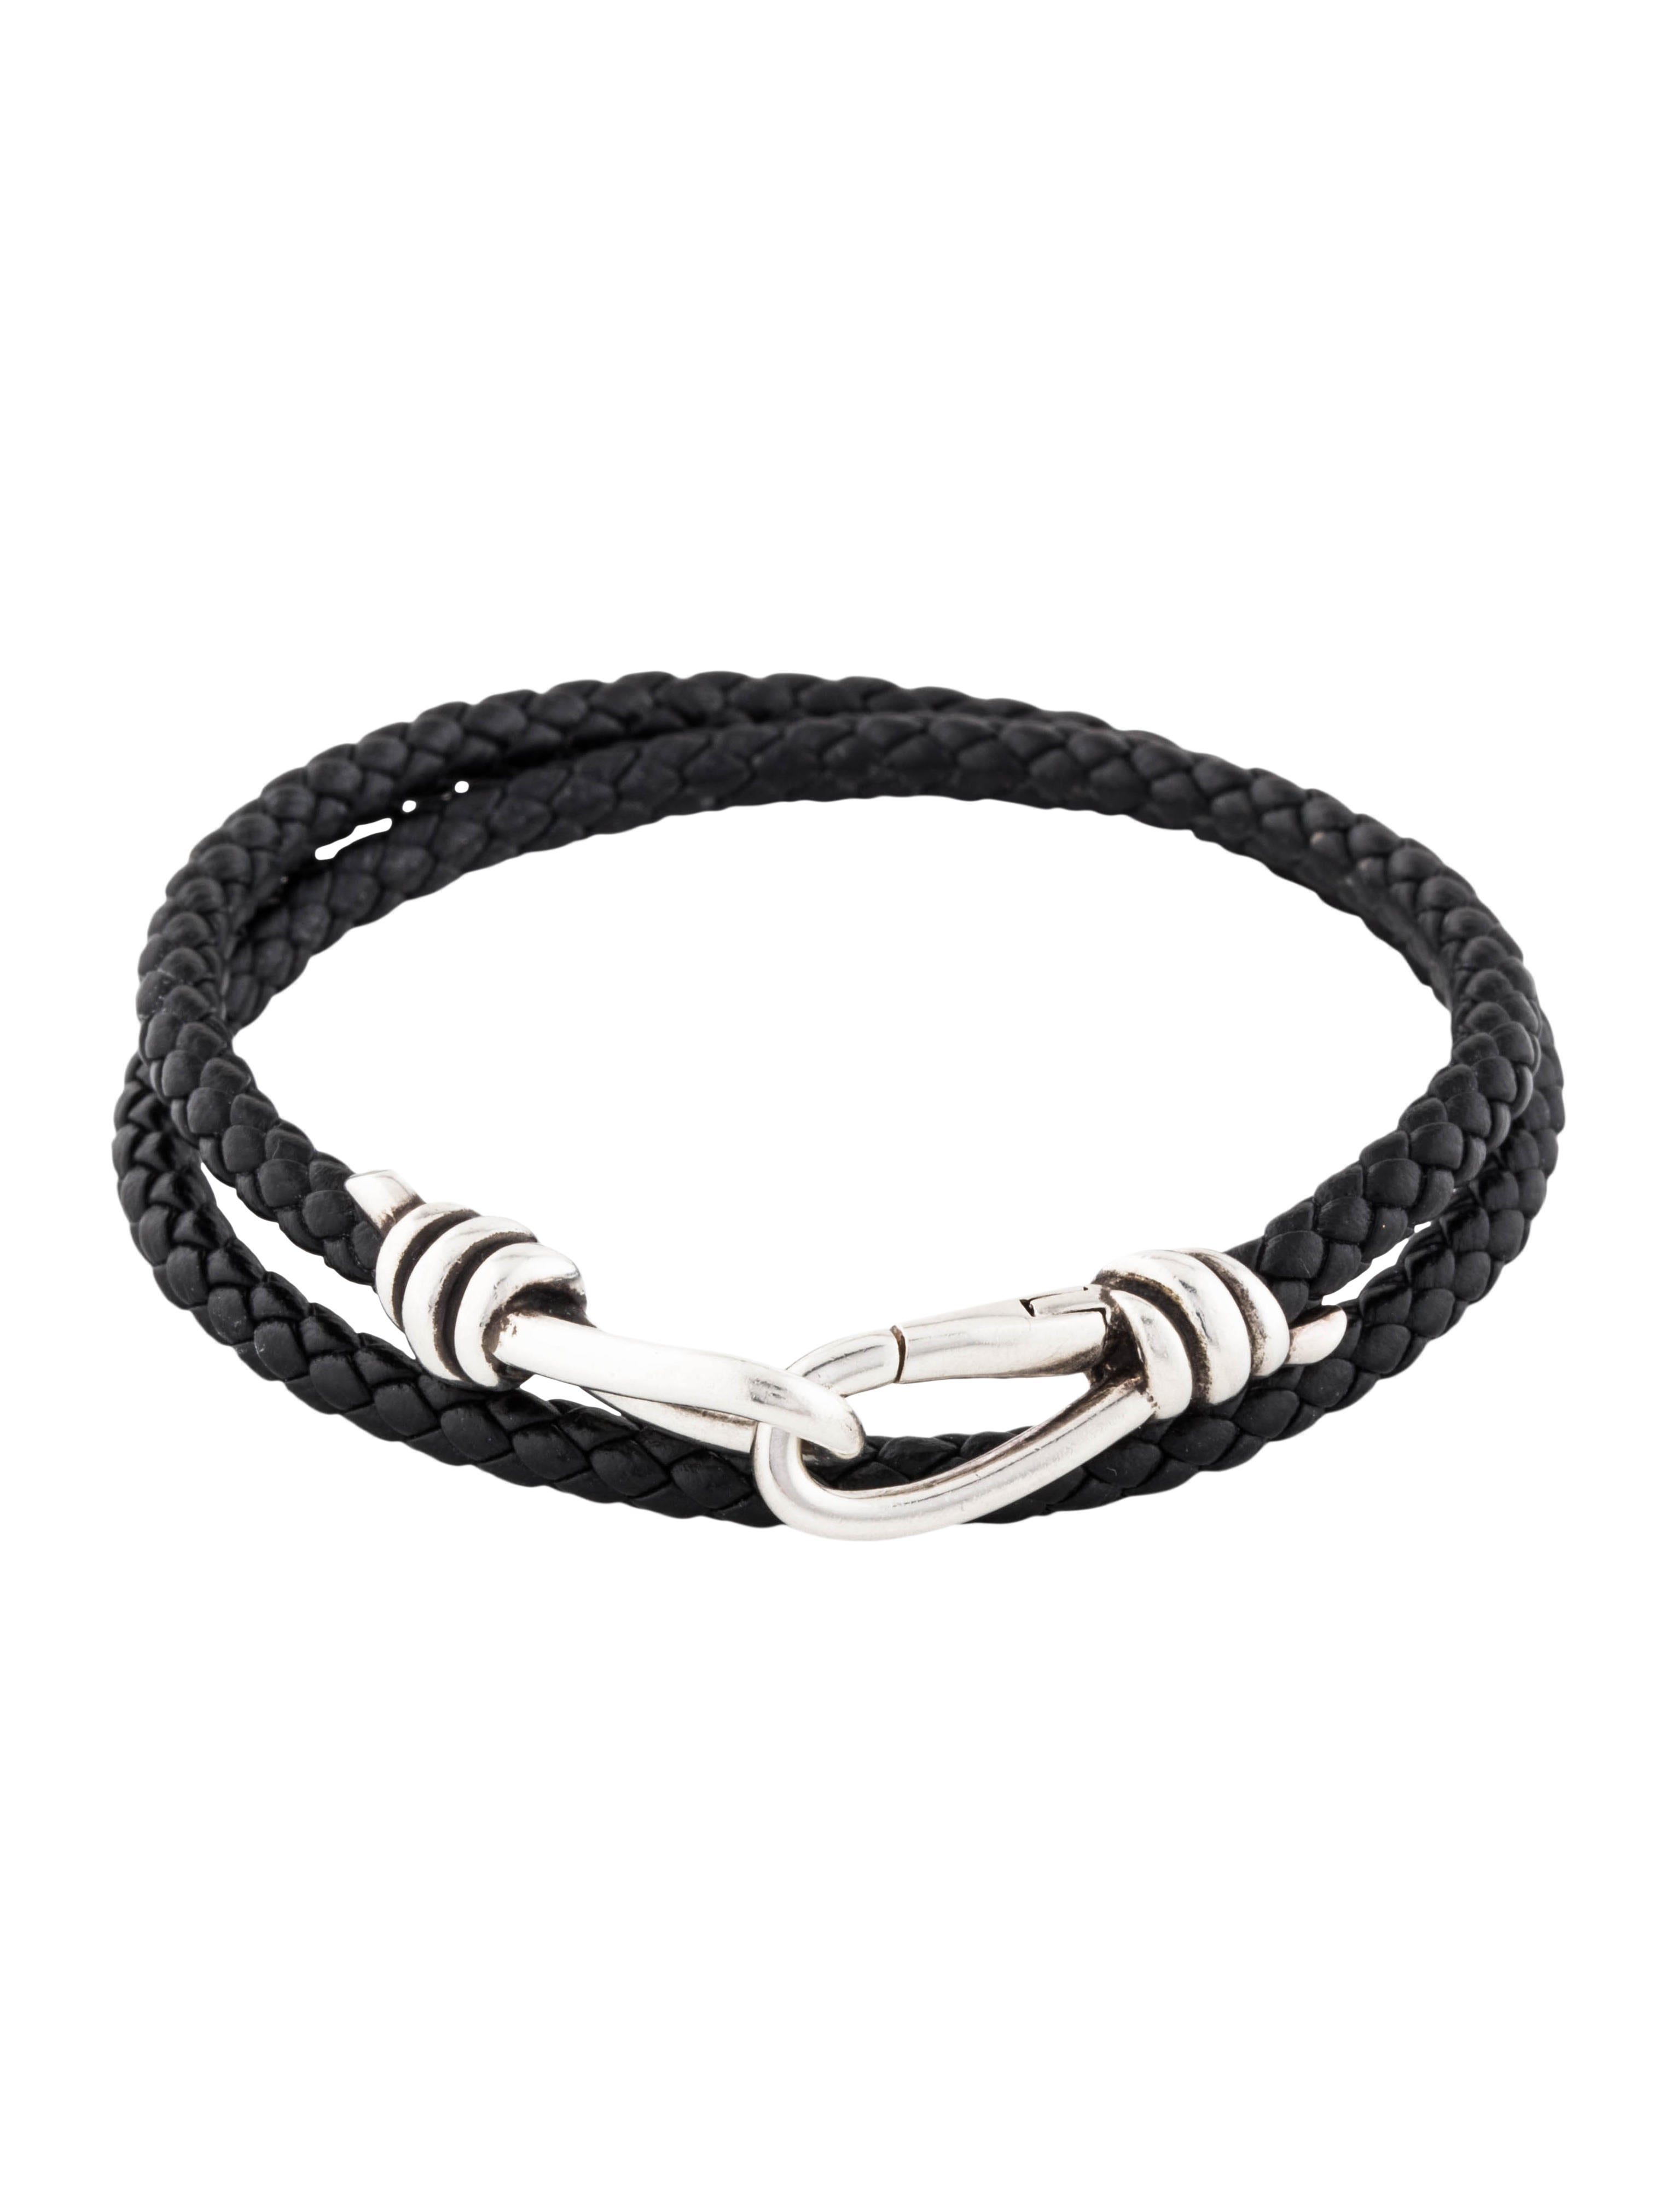 ca026c0b9 Tiffany & Co. Knot Double Braid Wrap Bracelet - Bracelets - TIF89180 ...